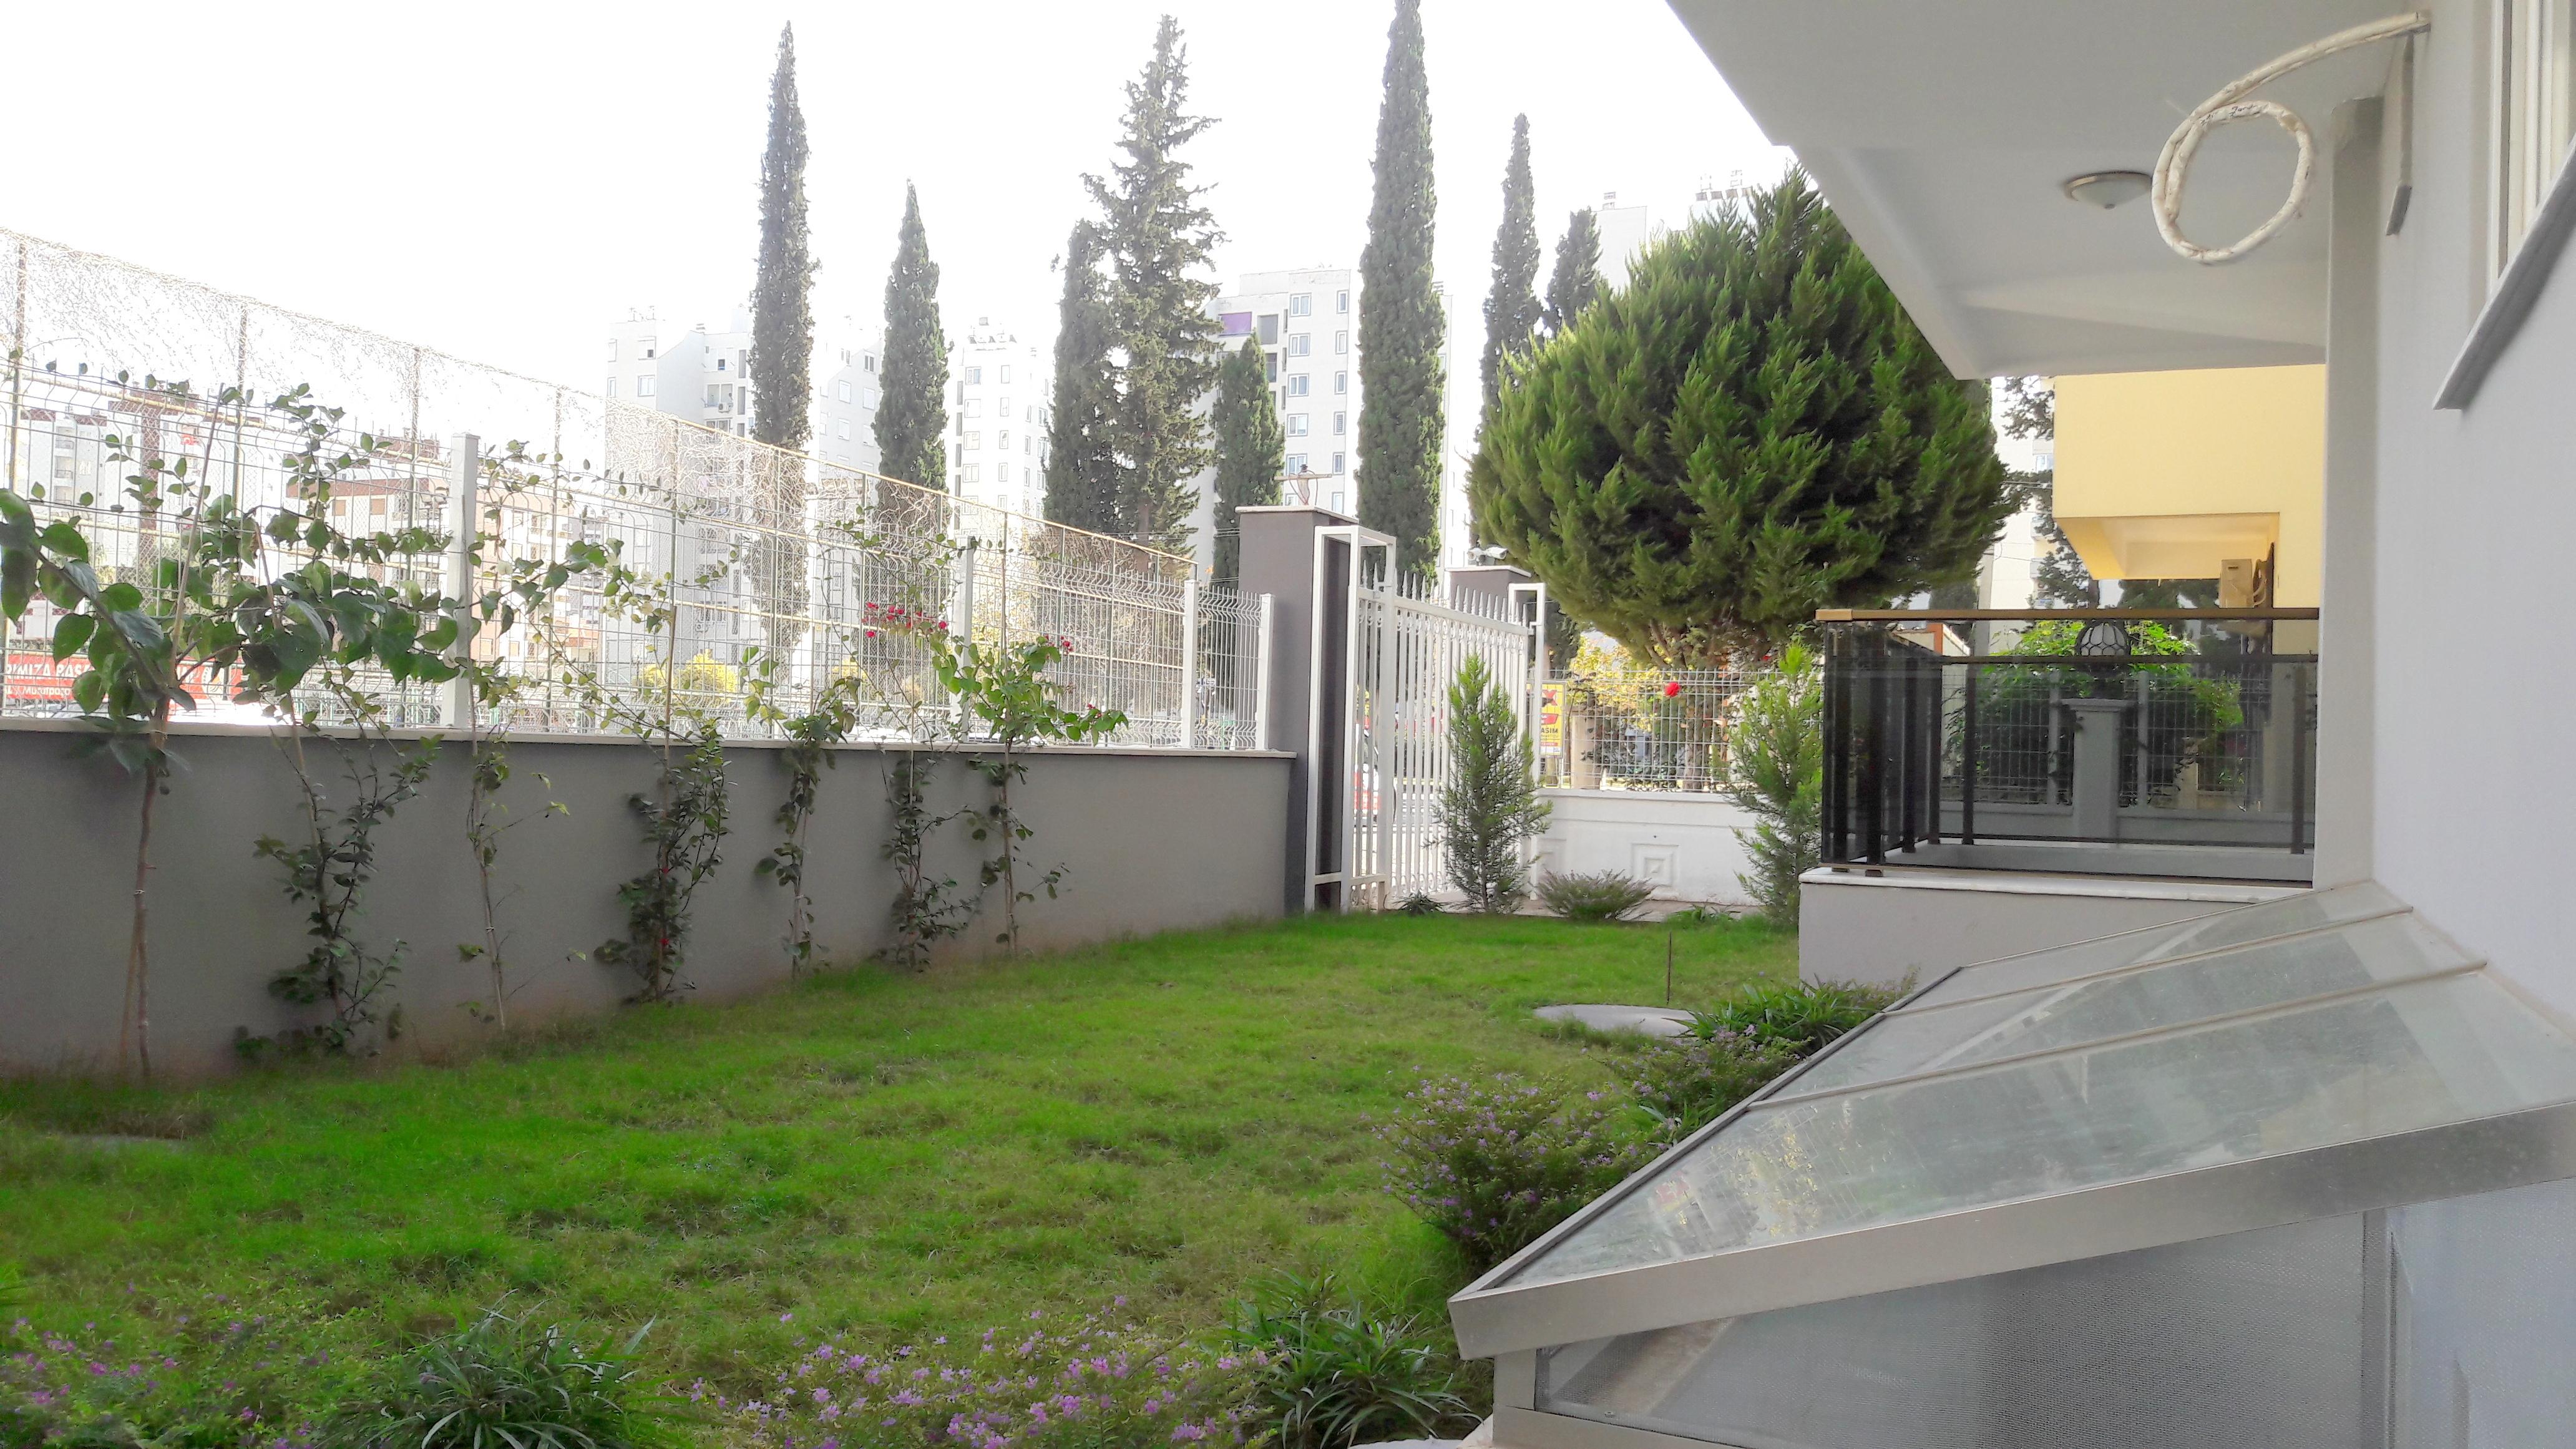 bahçe1